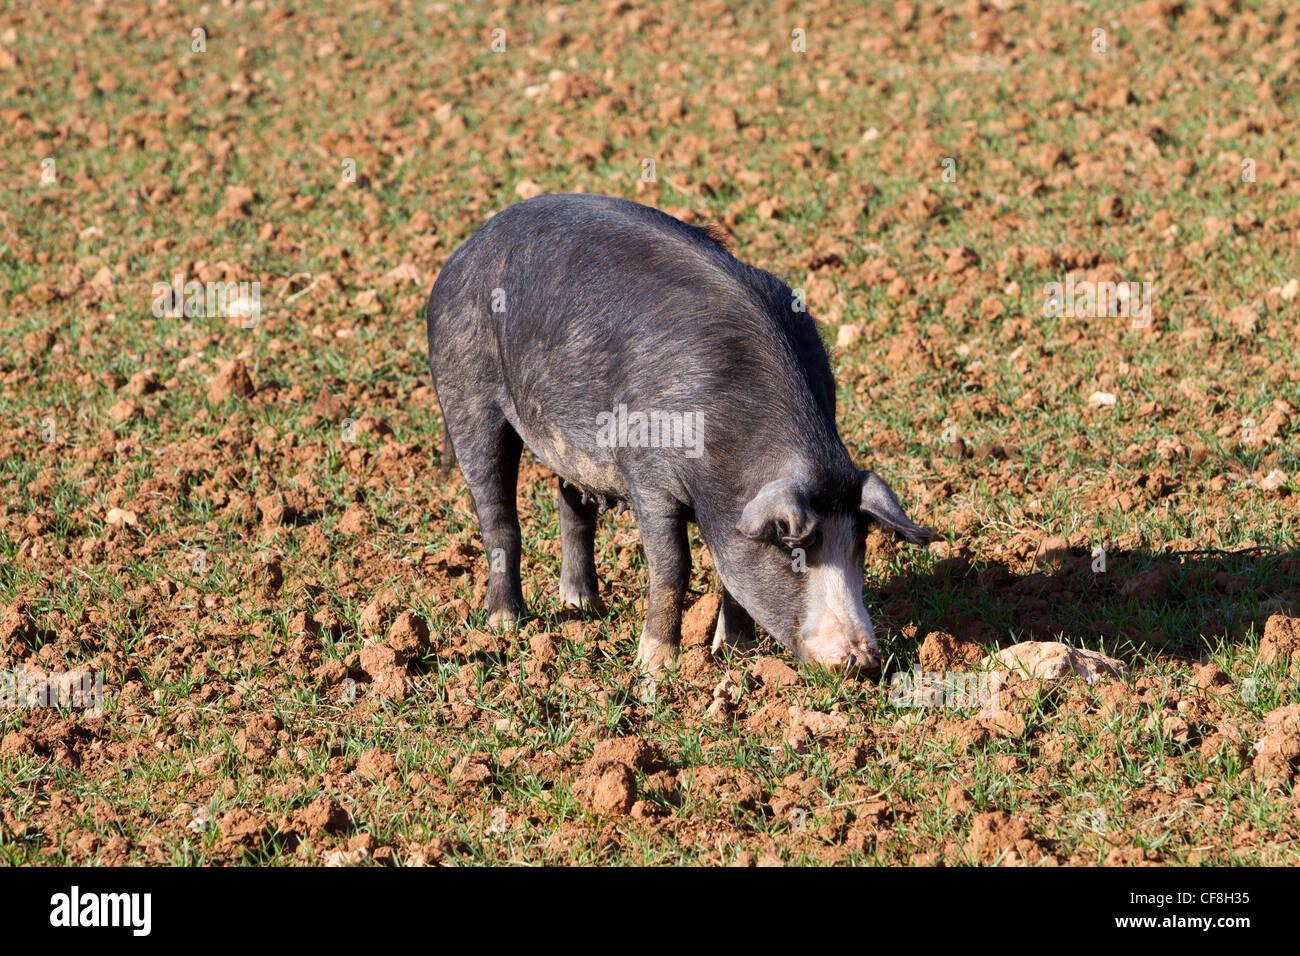 Black pig hiberian Pata Negra Majorcan Mallorca Spain - Stock Image